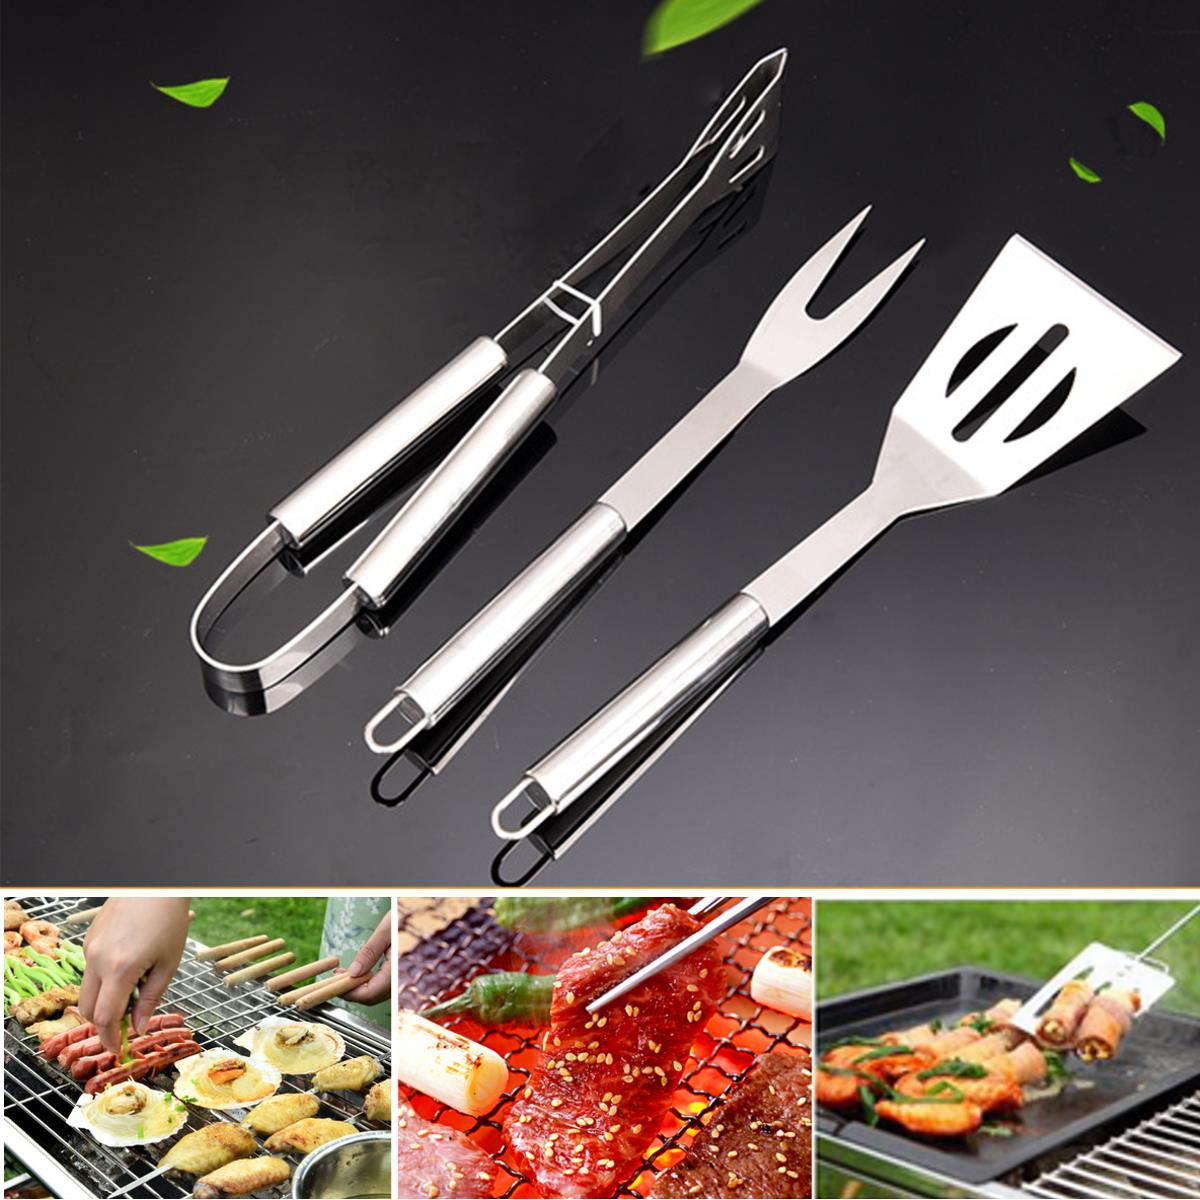 3Pcs BBQ Barbecue Tableware  sc 1 st  Alex NLD & 3Pcs BBQ Barbecue Tableware Stainless Steel Cooking Fork Gripper ...